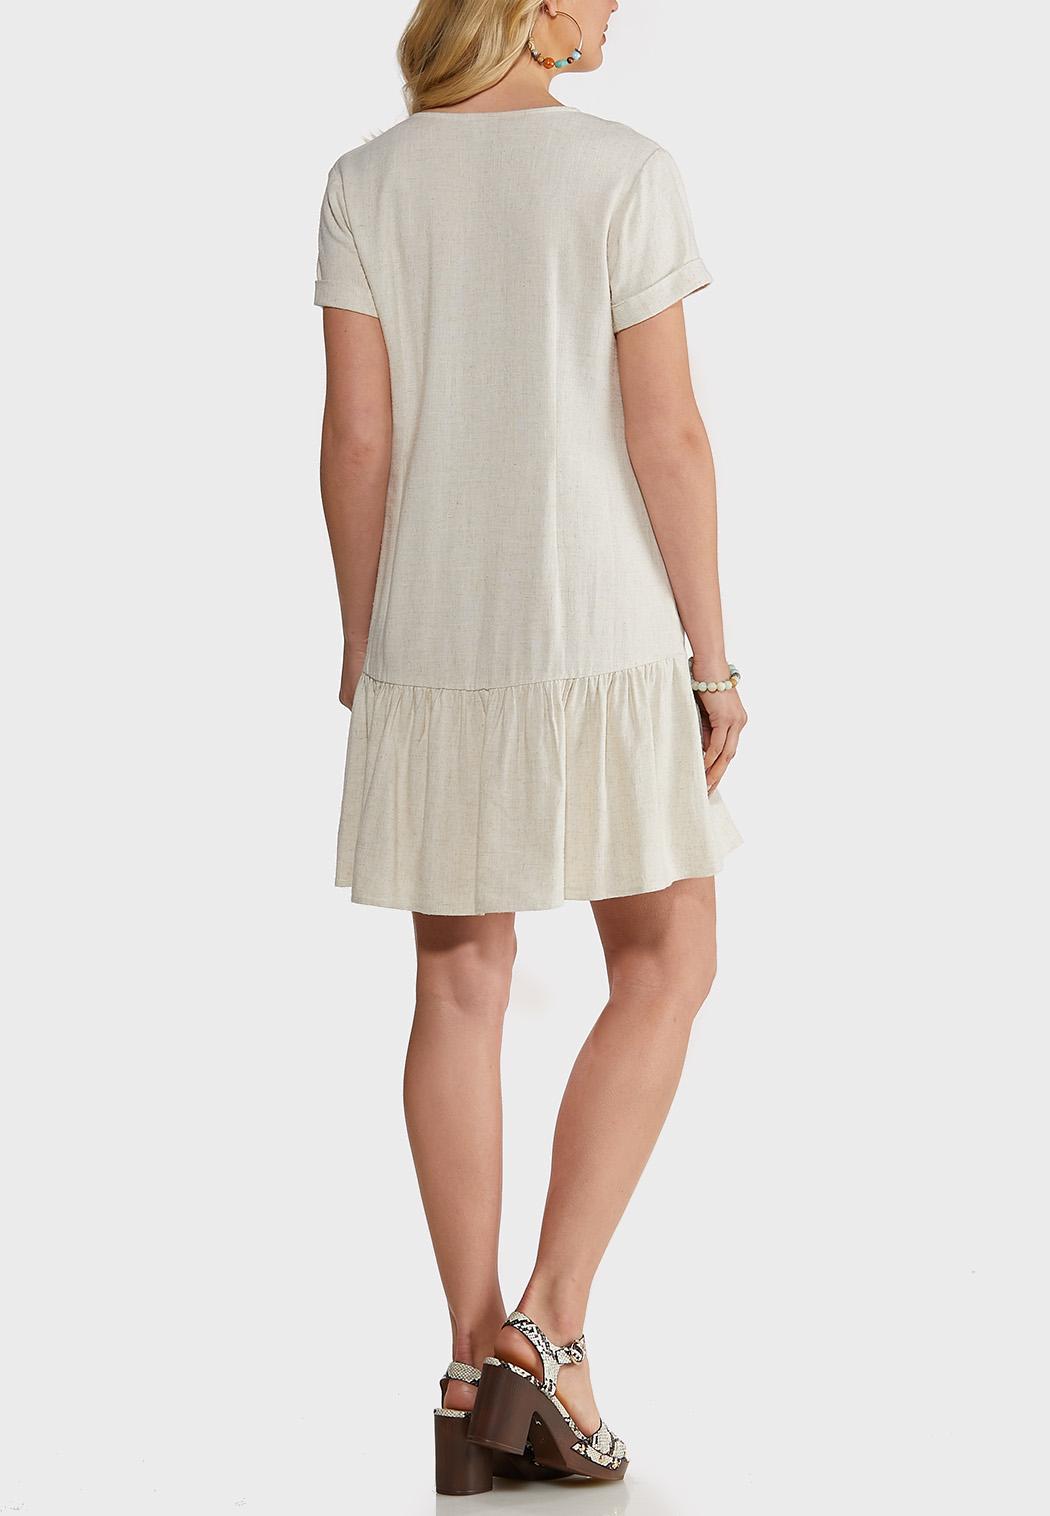 Flounced Linen Swing Dress (Item #44172953)